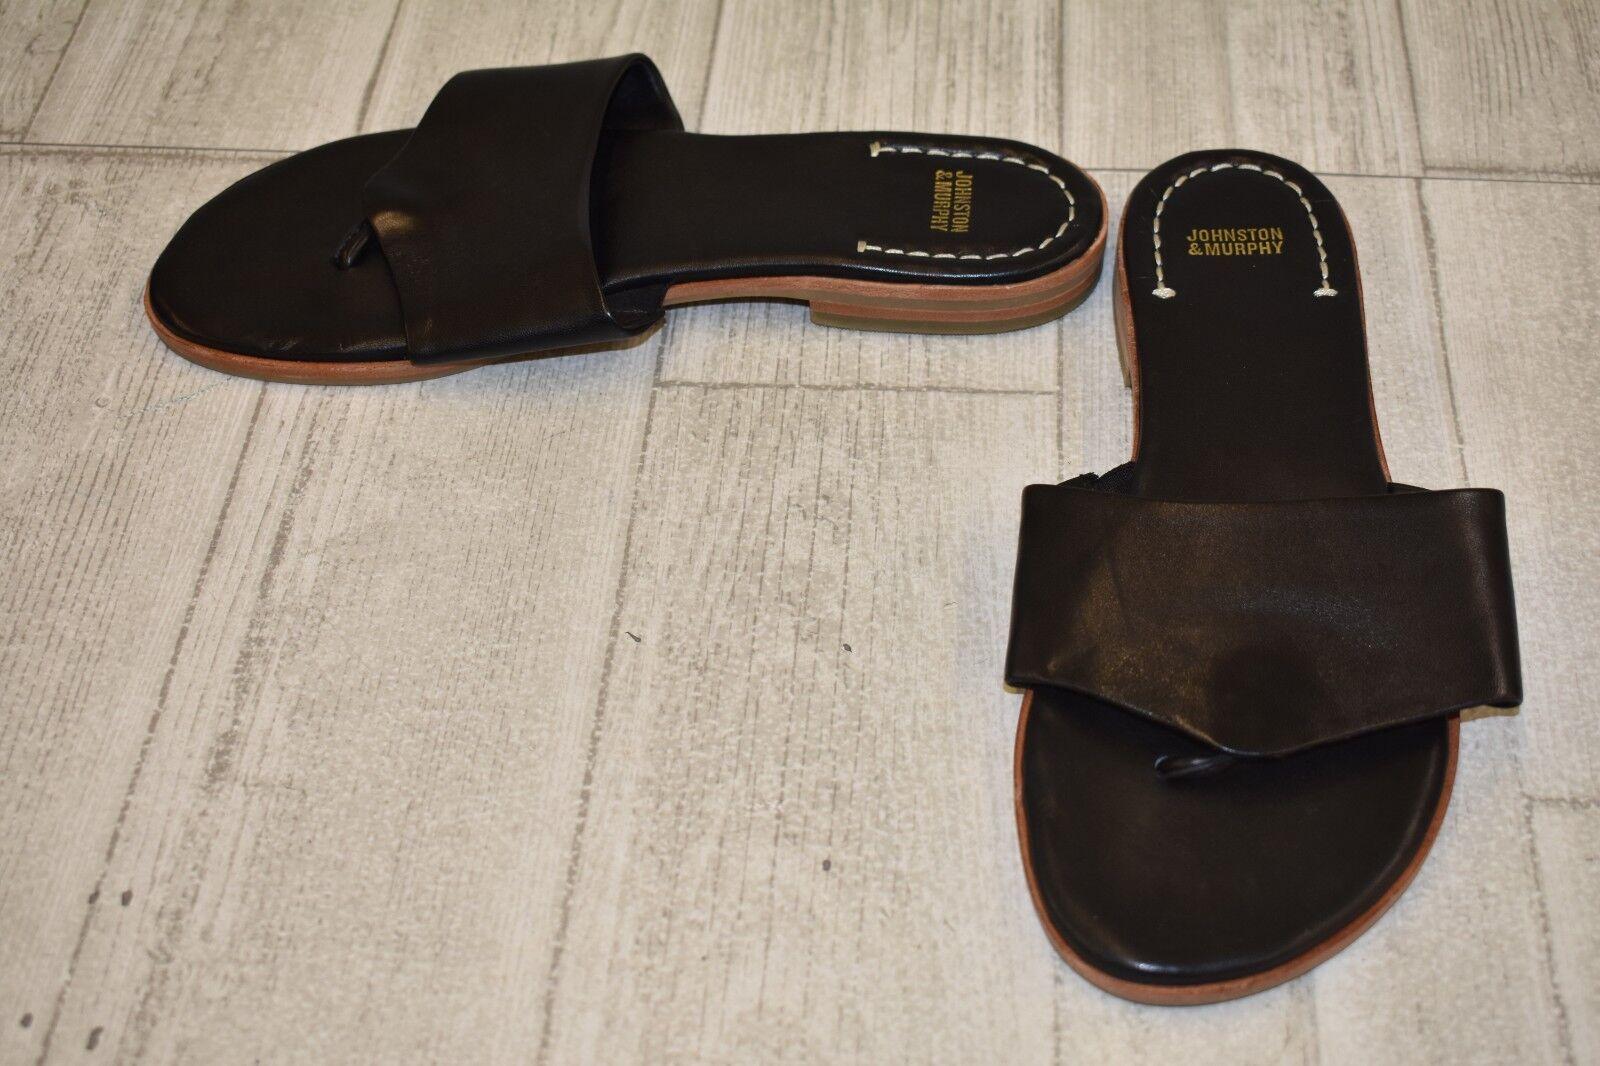 Johnston and Murphy Raney Flip Flops-Women's size 8.5 M Black